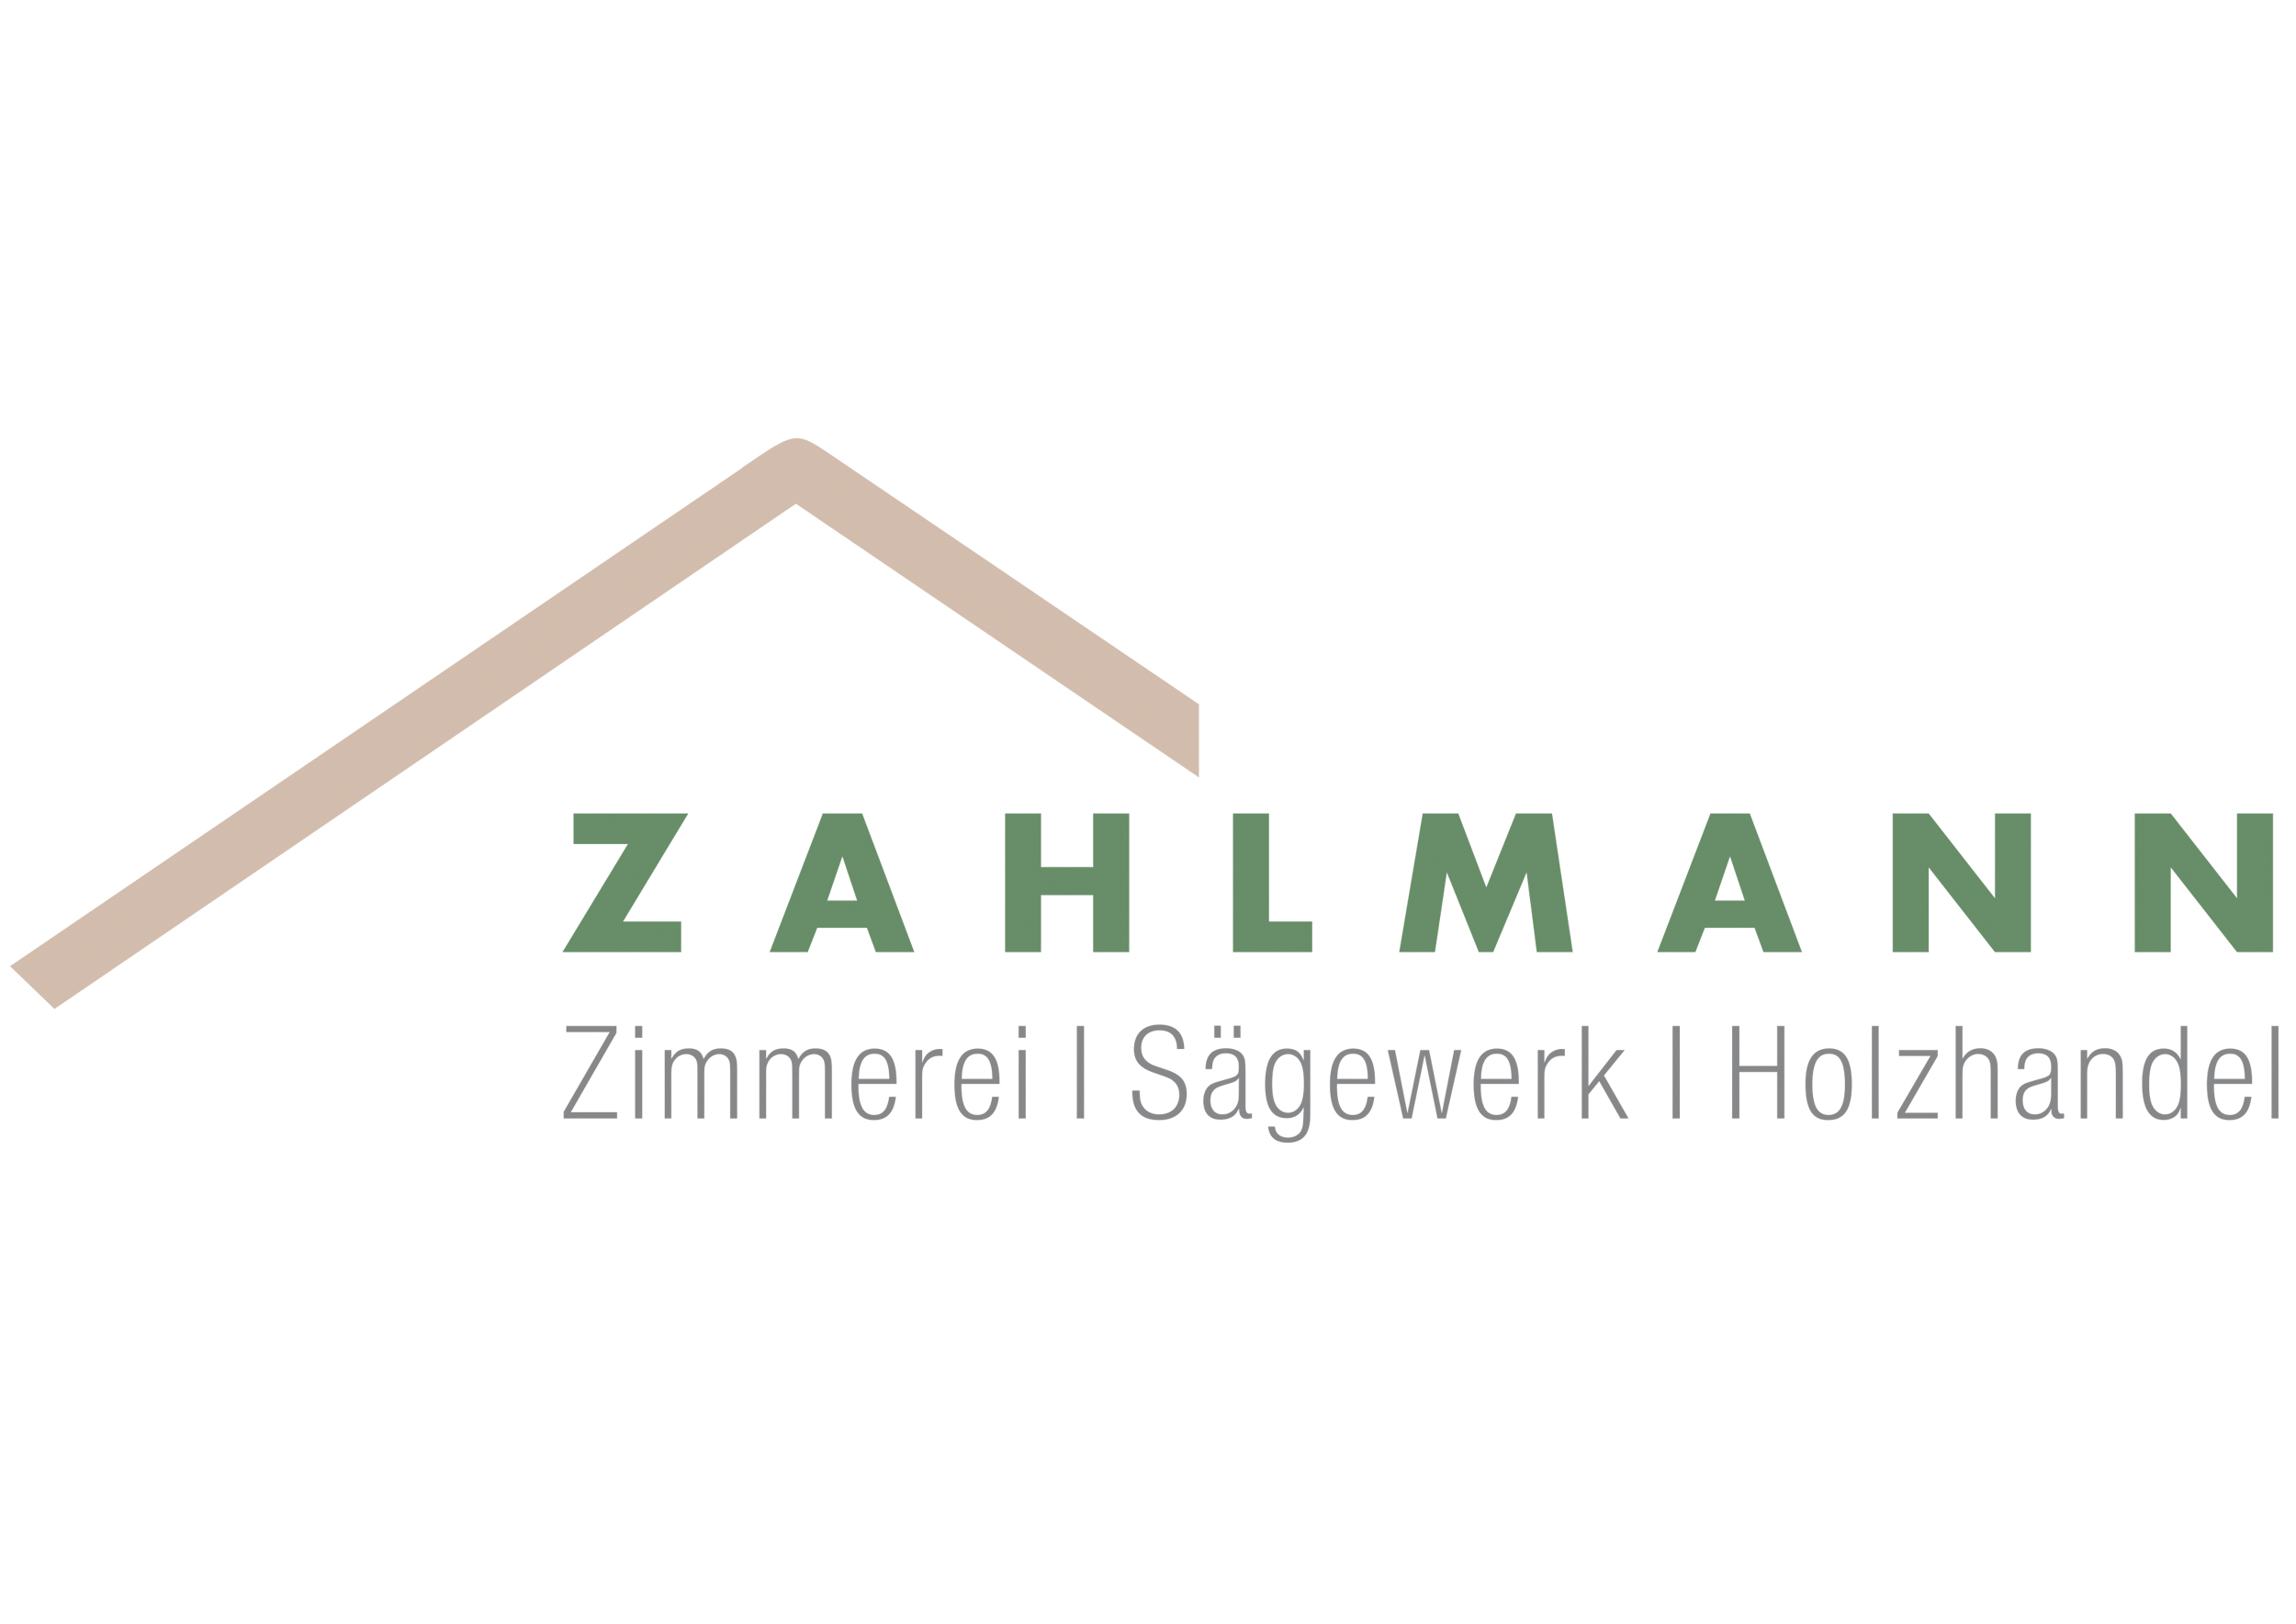 bzb_web_zahlmann_logo_2500x1768.jpg